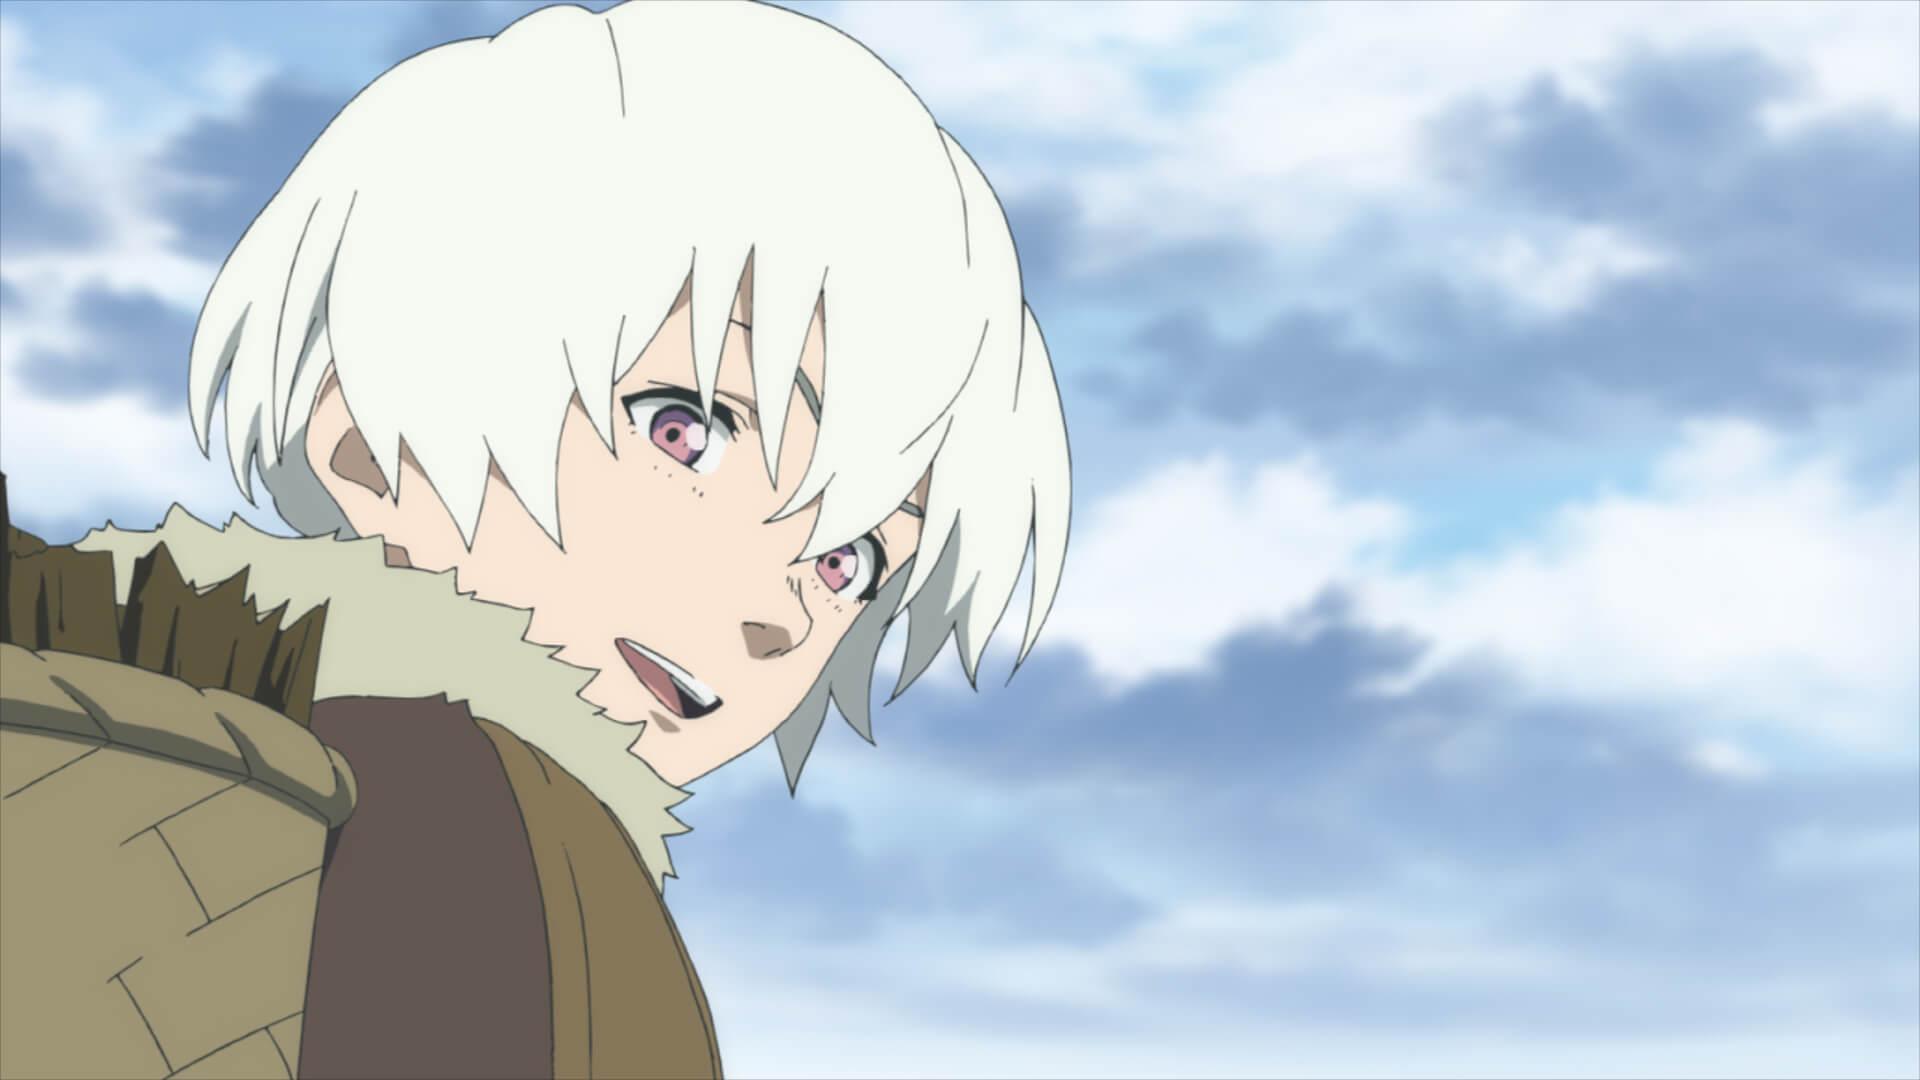 『SHAMAN KING』、『極主夫道』、『転スラ日記』など話題作目白押し!Netflix4月配信のアニメラインナップが解禁 art210326_netflix_anime_4